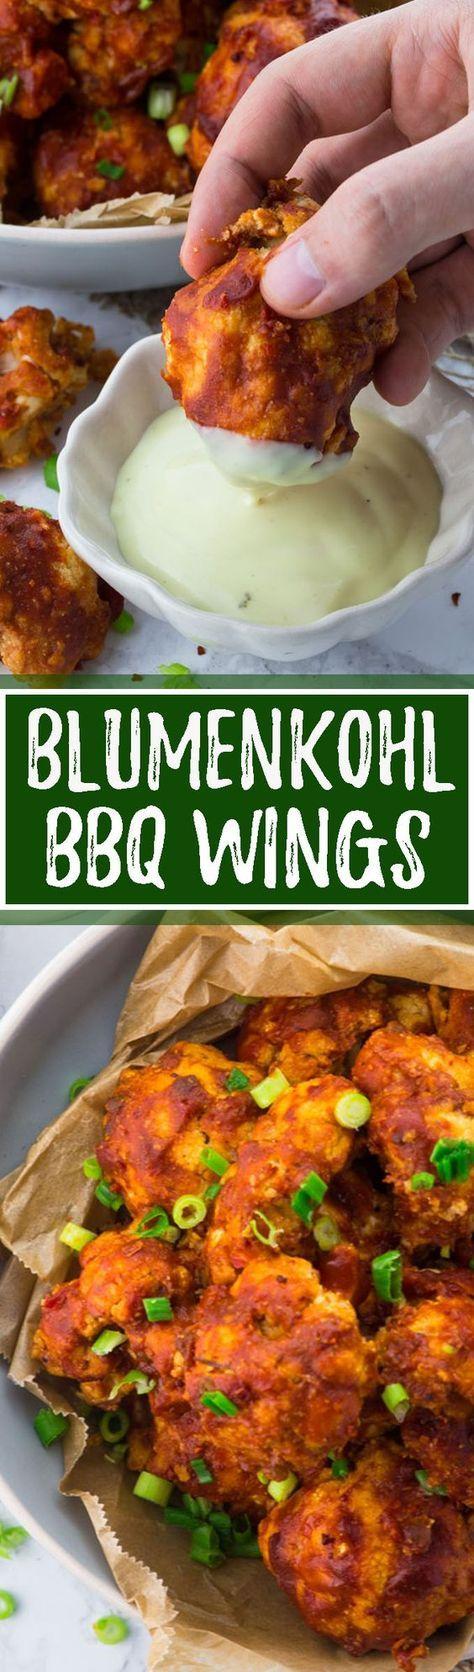 Blumenkohl bbq wings